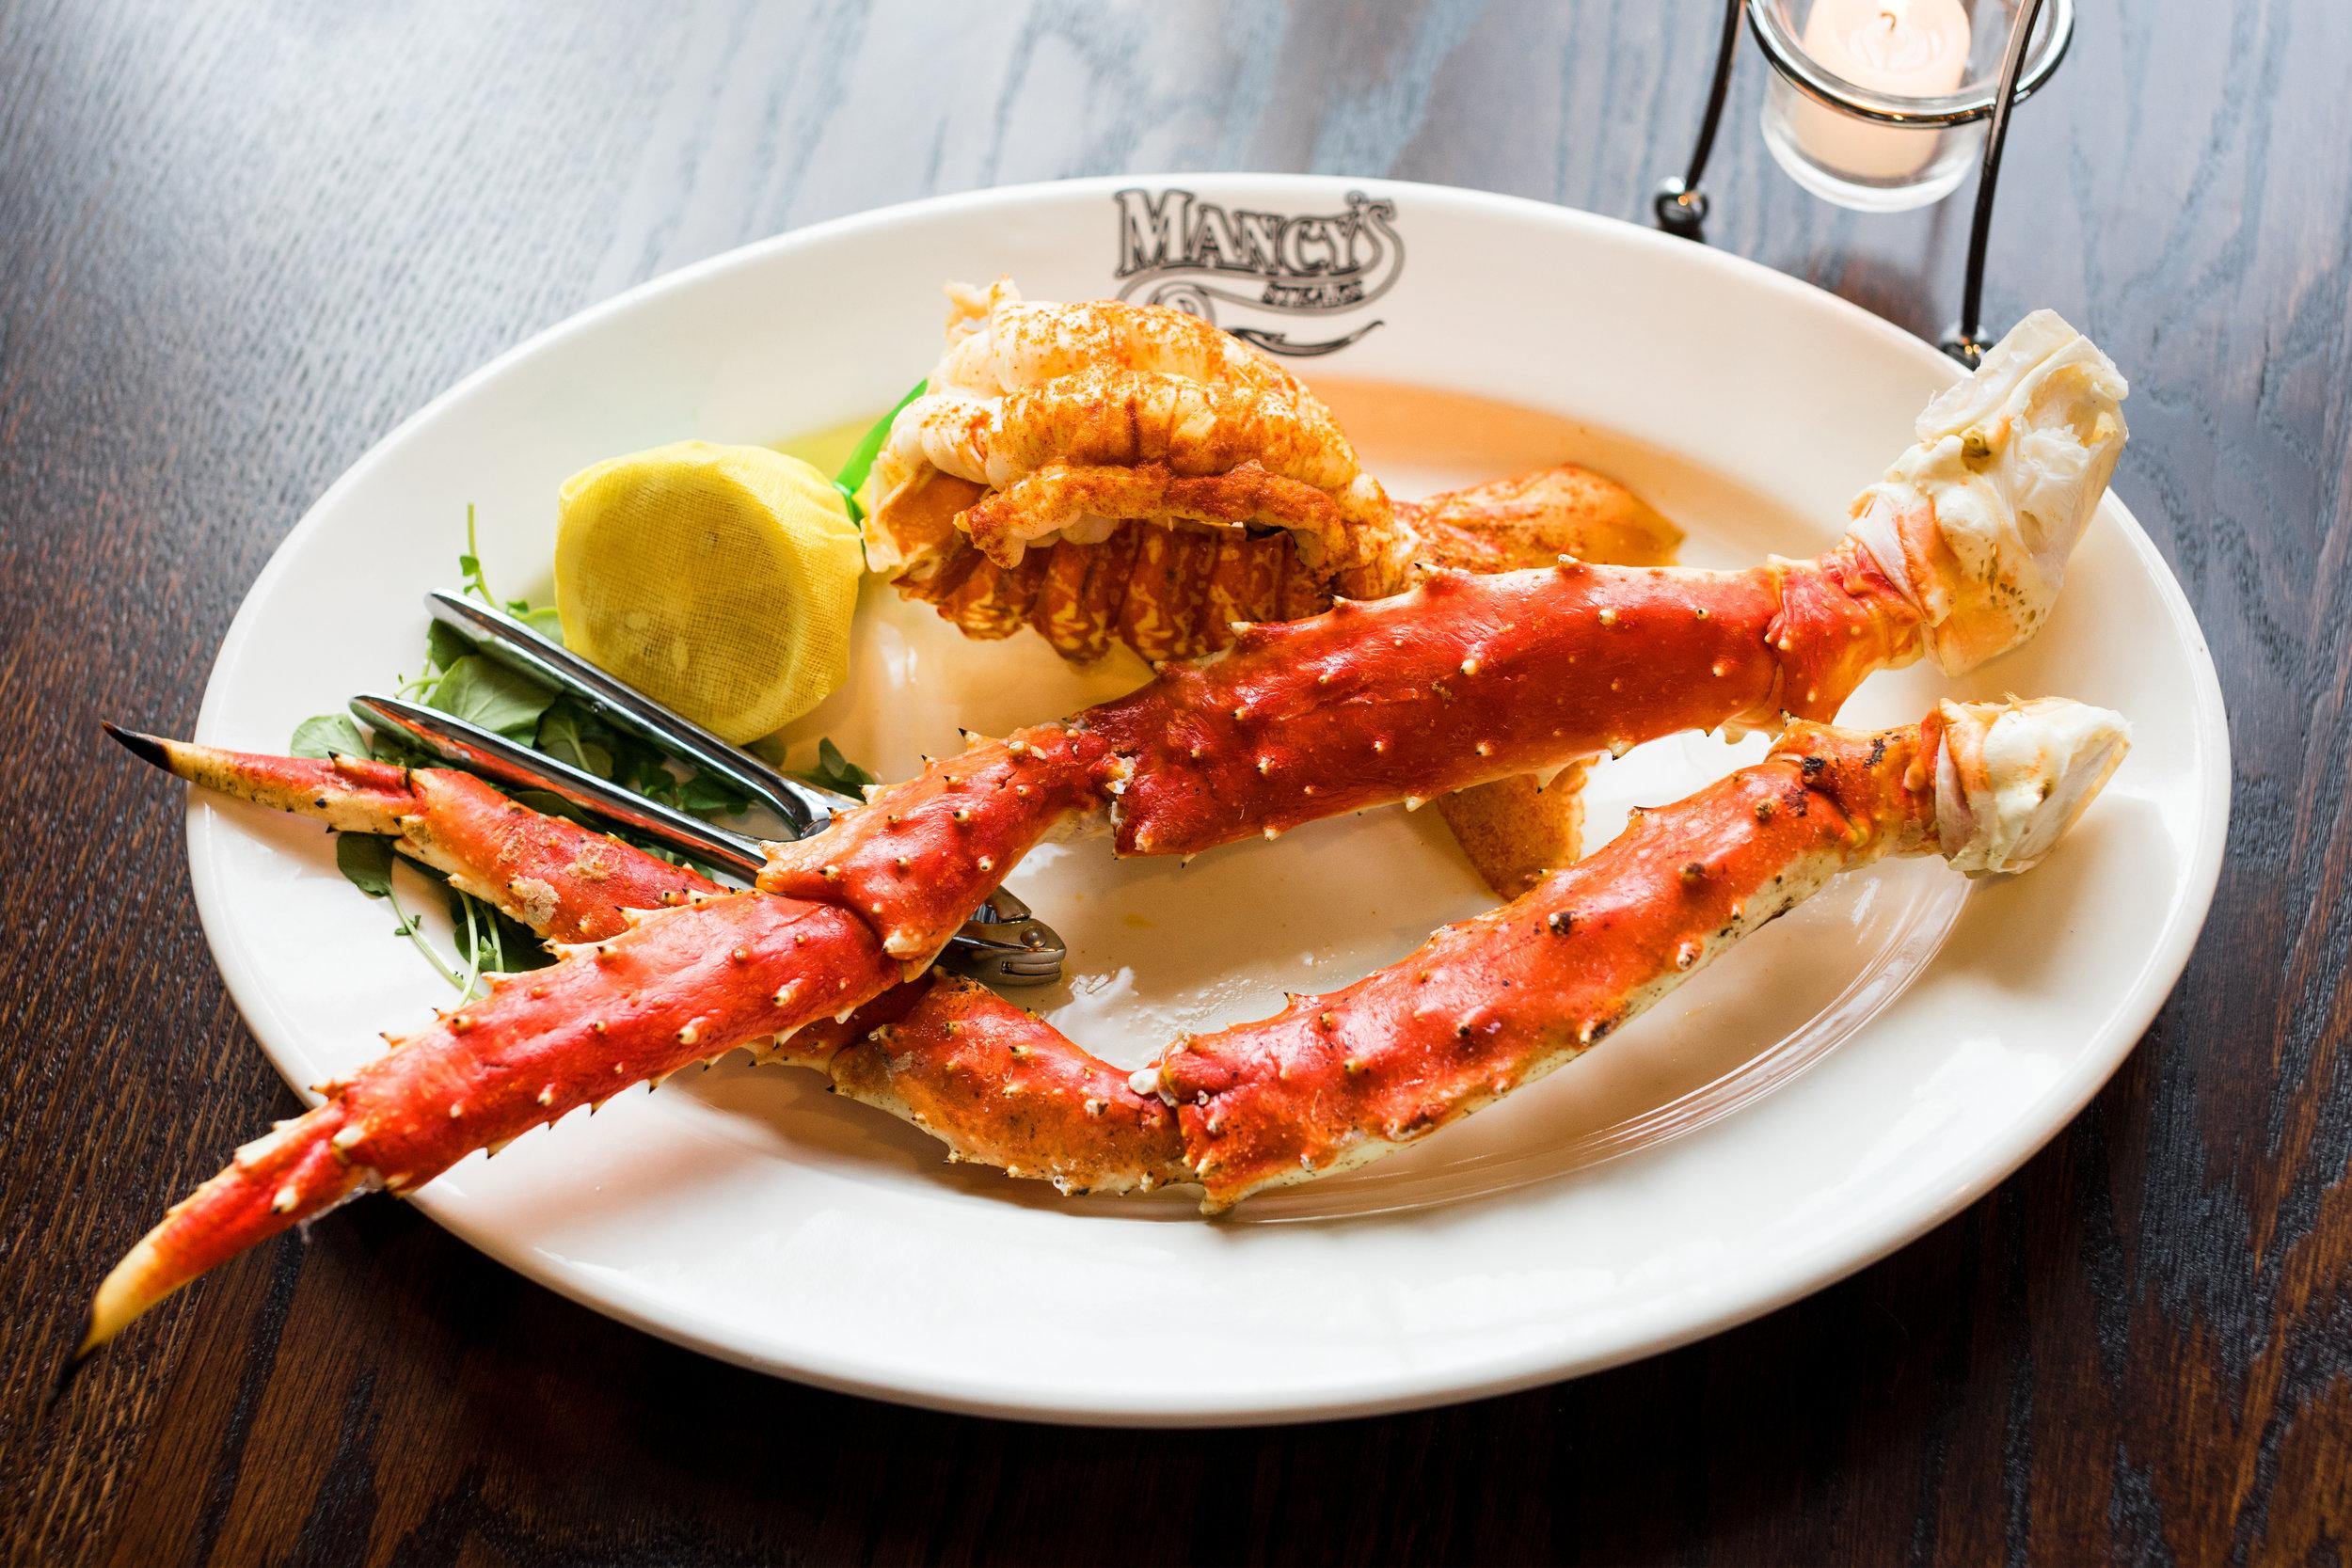 Hancock-Mancys-Lobster-Crab-1.jpg